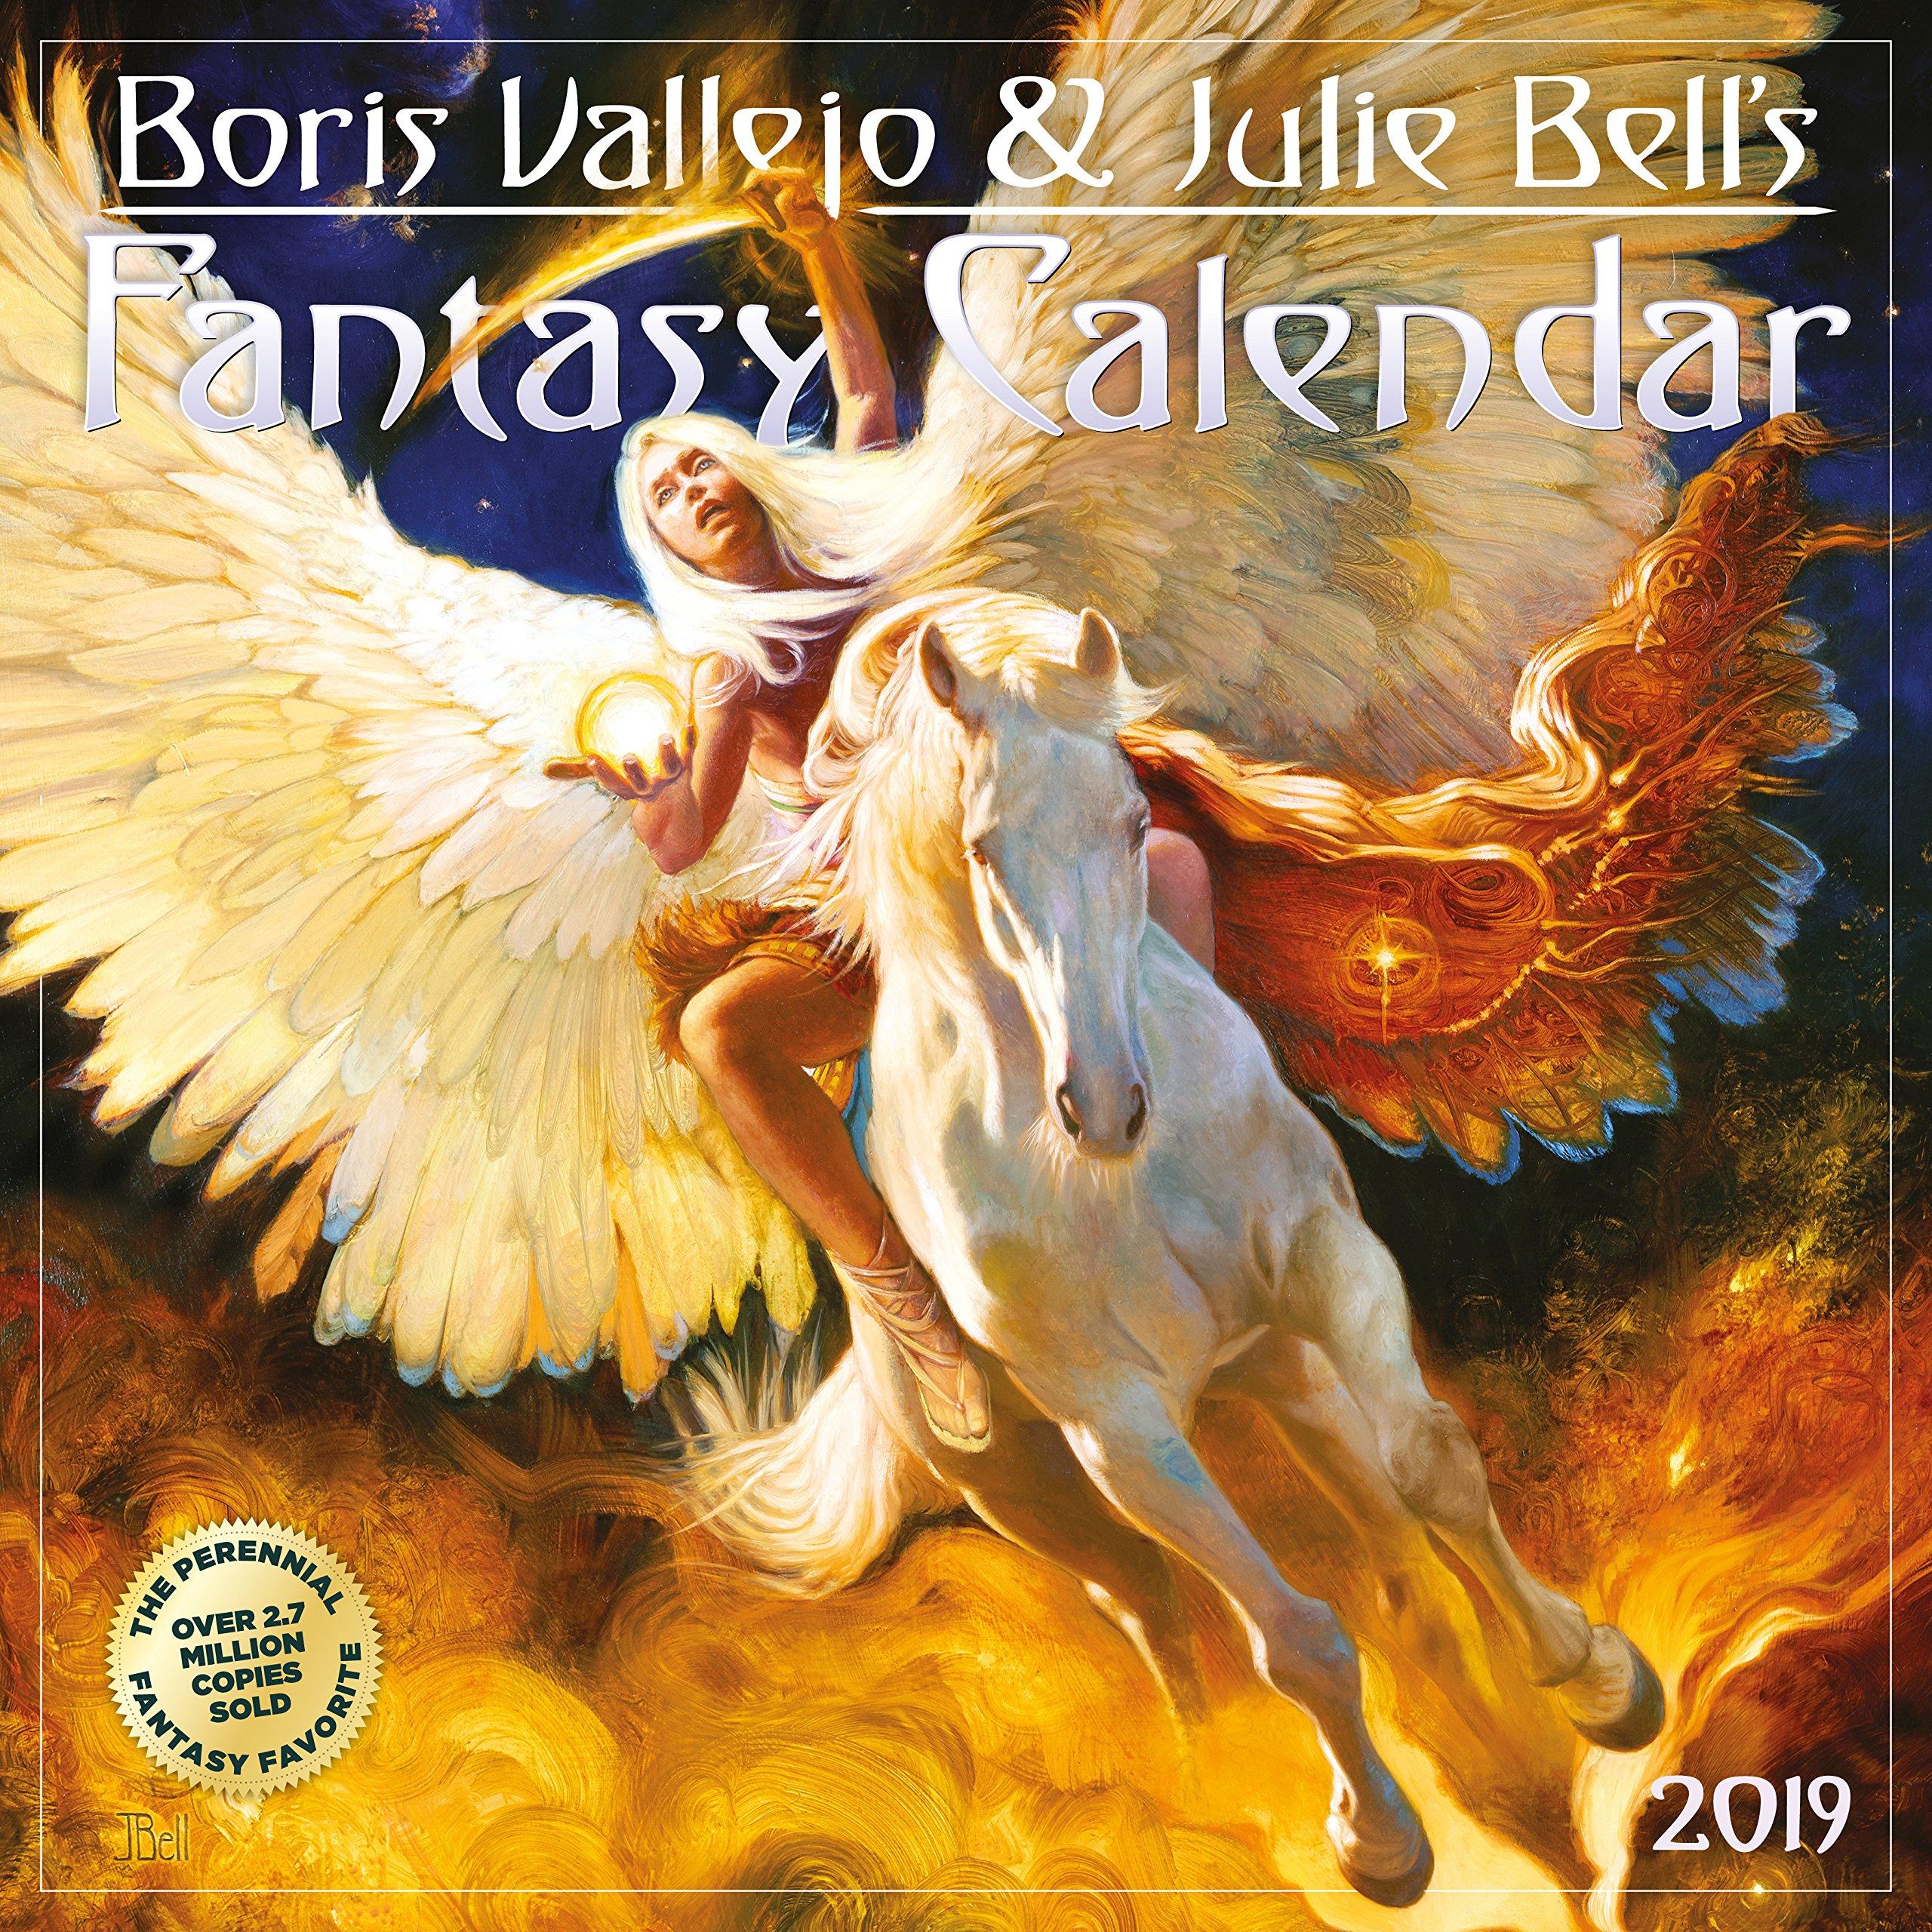 Boris Vallejo & Julie Bell's Fantasy Wall Calendar 2019 by Workman Publishing (Image #1)